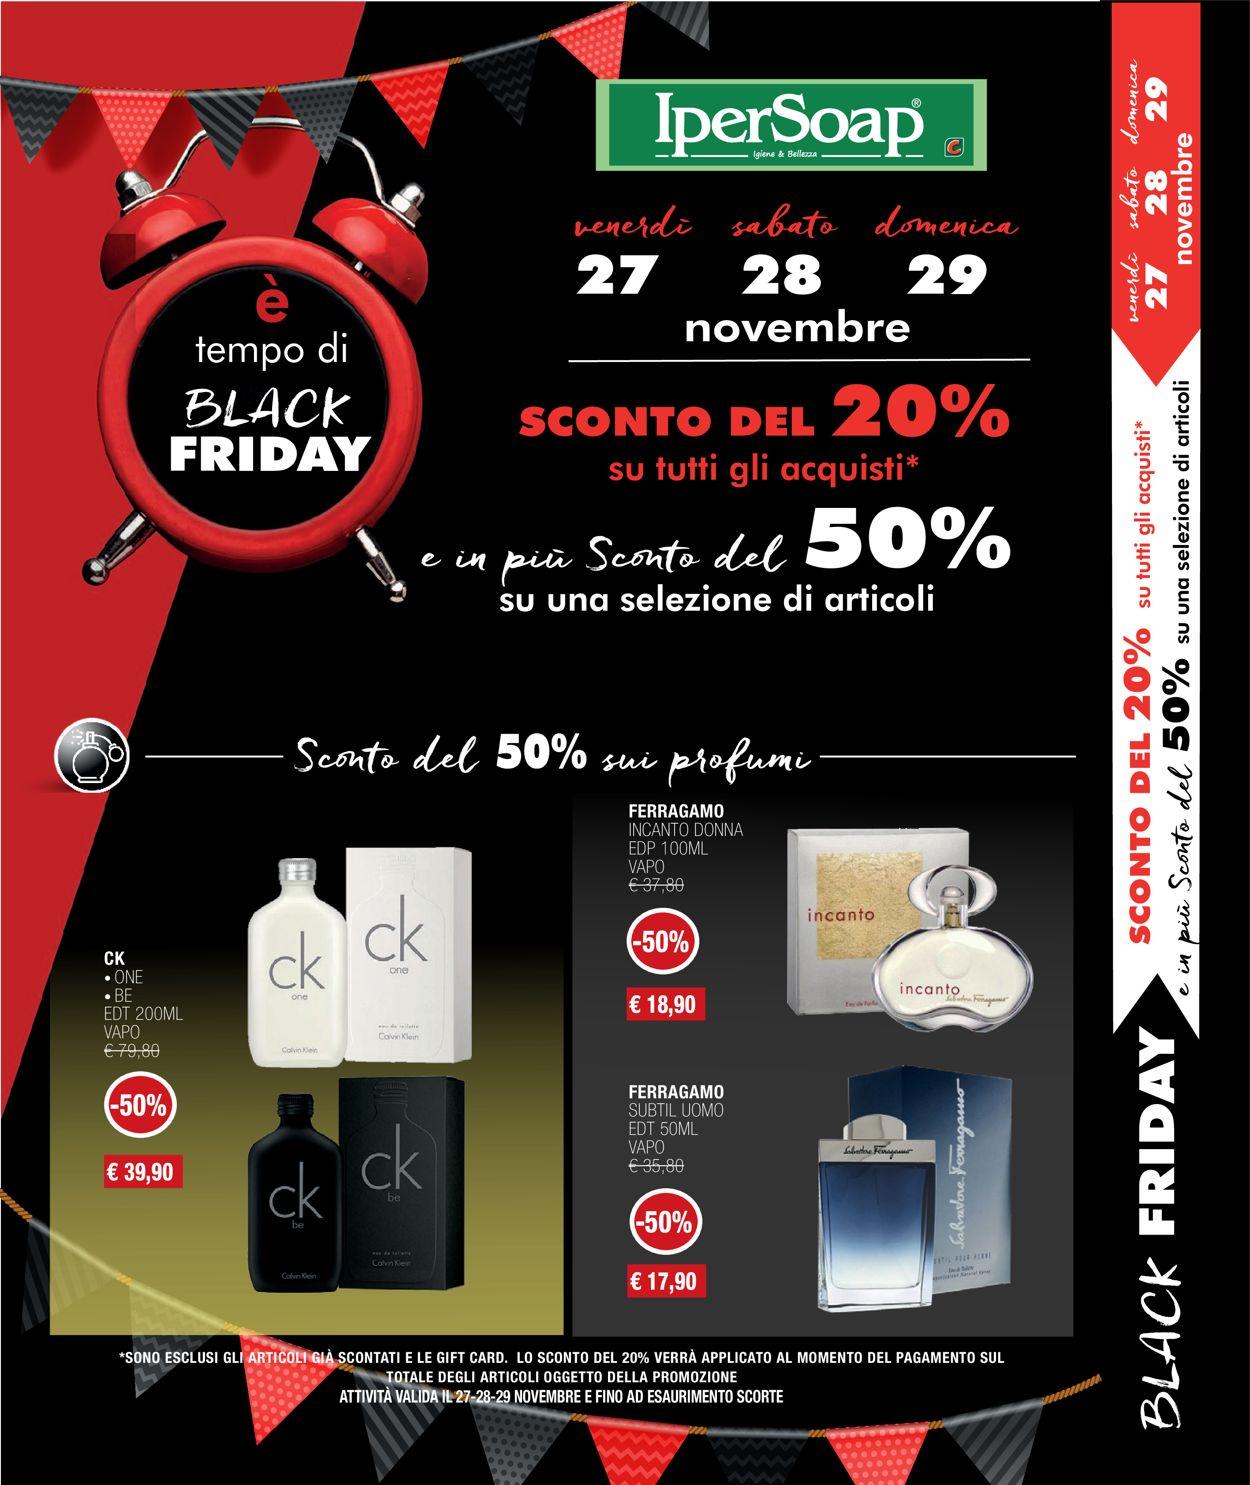 Volantino IperSoap - Black Friday 2020 - Offerte 27/11-29/11/2020